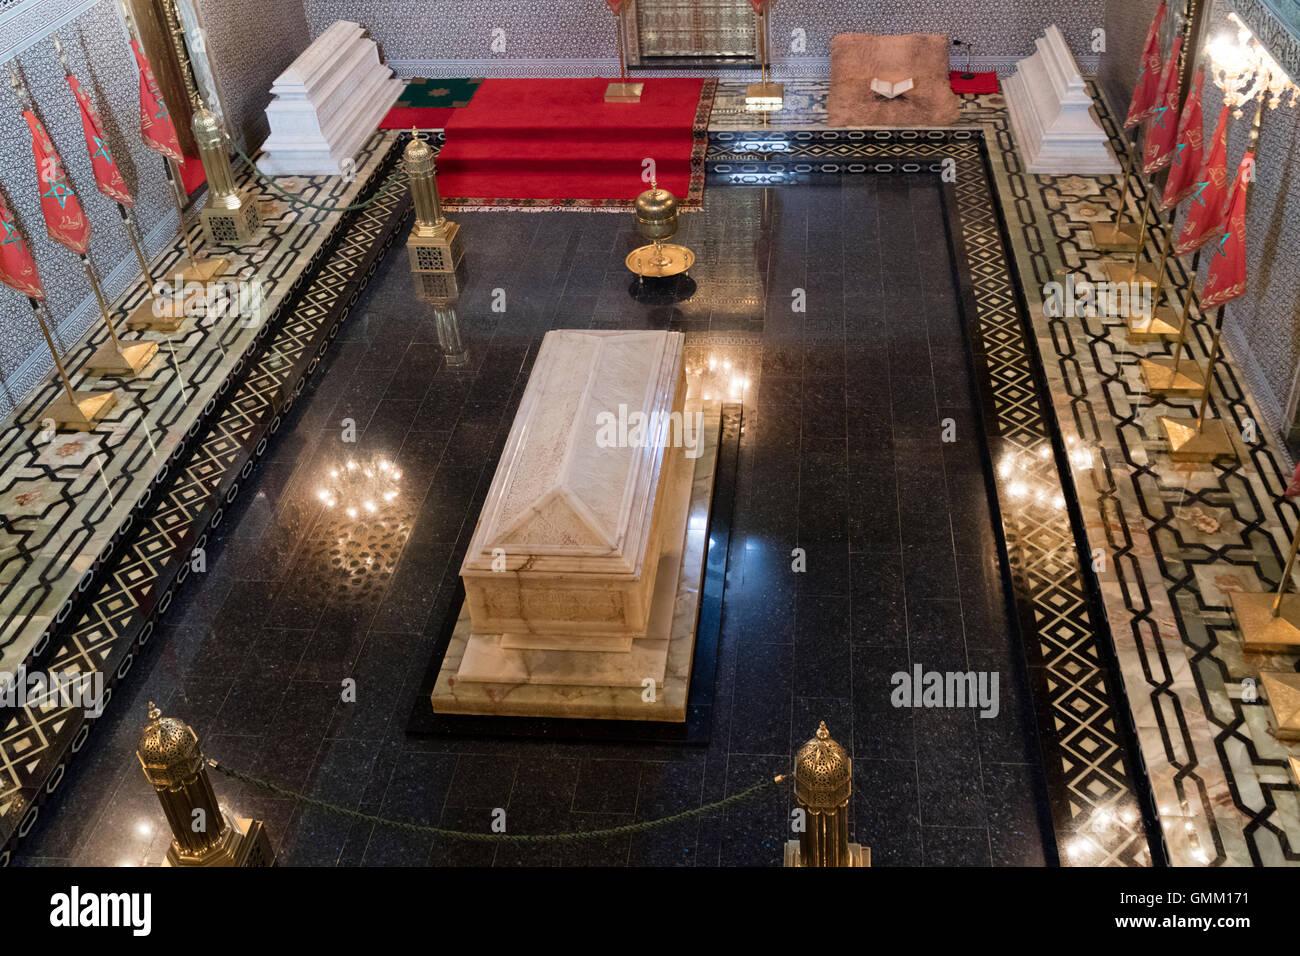 Innere des das Mausoleum von Mohammed V in Rabat, Marokko, Stockbild